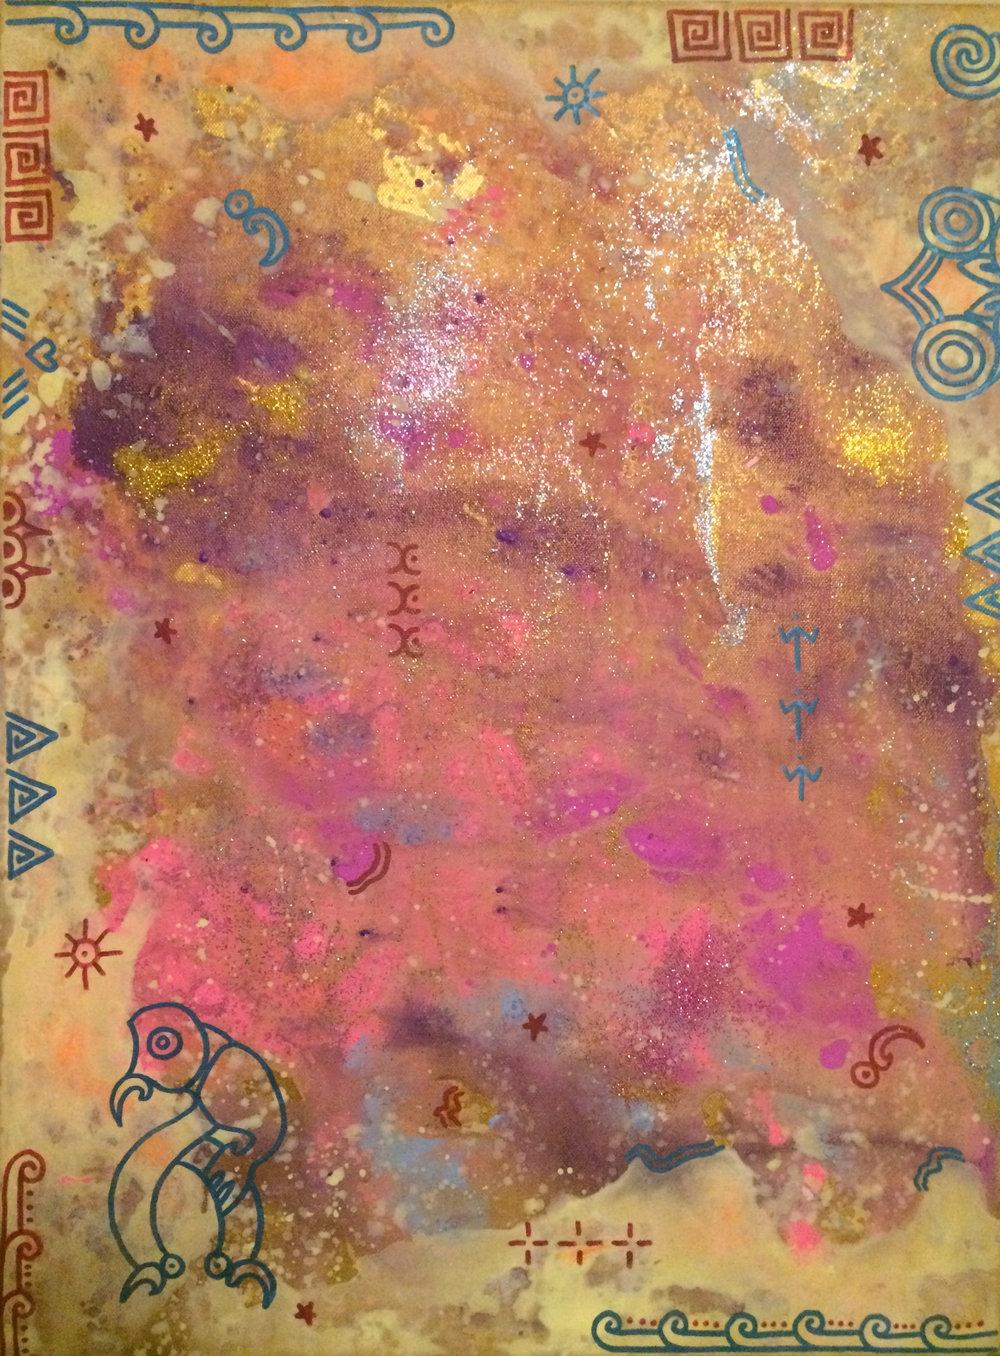 'Ancestor dreaming'  by Taryn Beri.